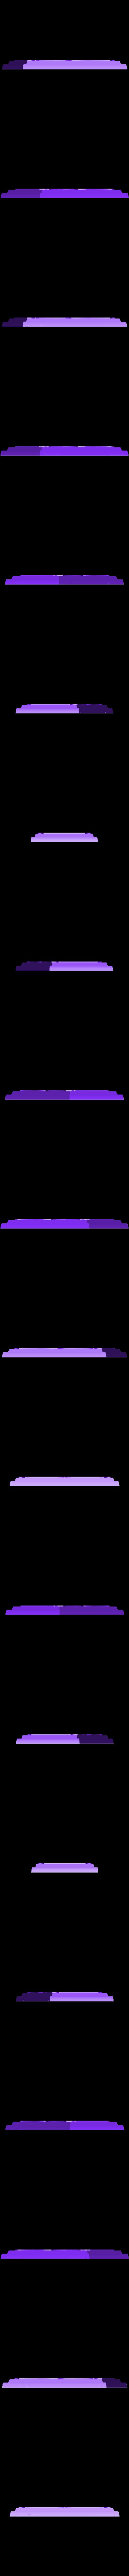 Tapion's Music Box - Top.stl Télécharger fichier STL Tapion Music Box - Dragon Ball • Plan pour impression 3D, BODY3D